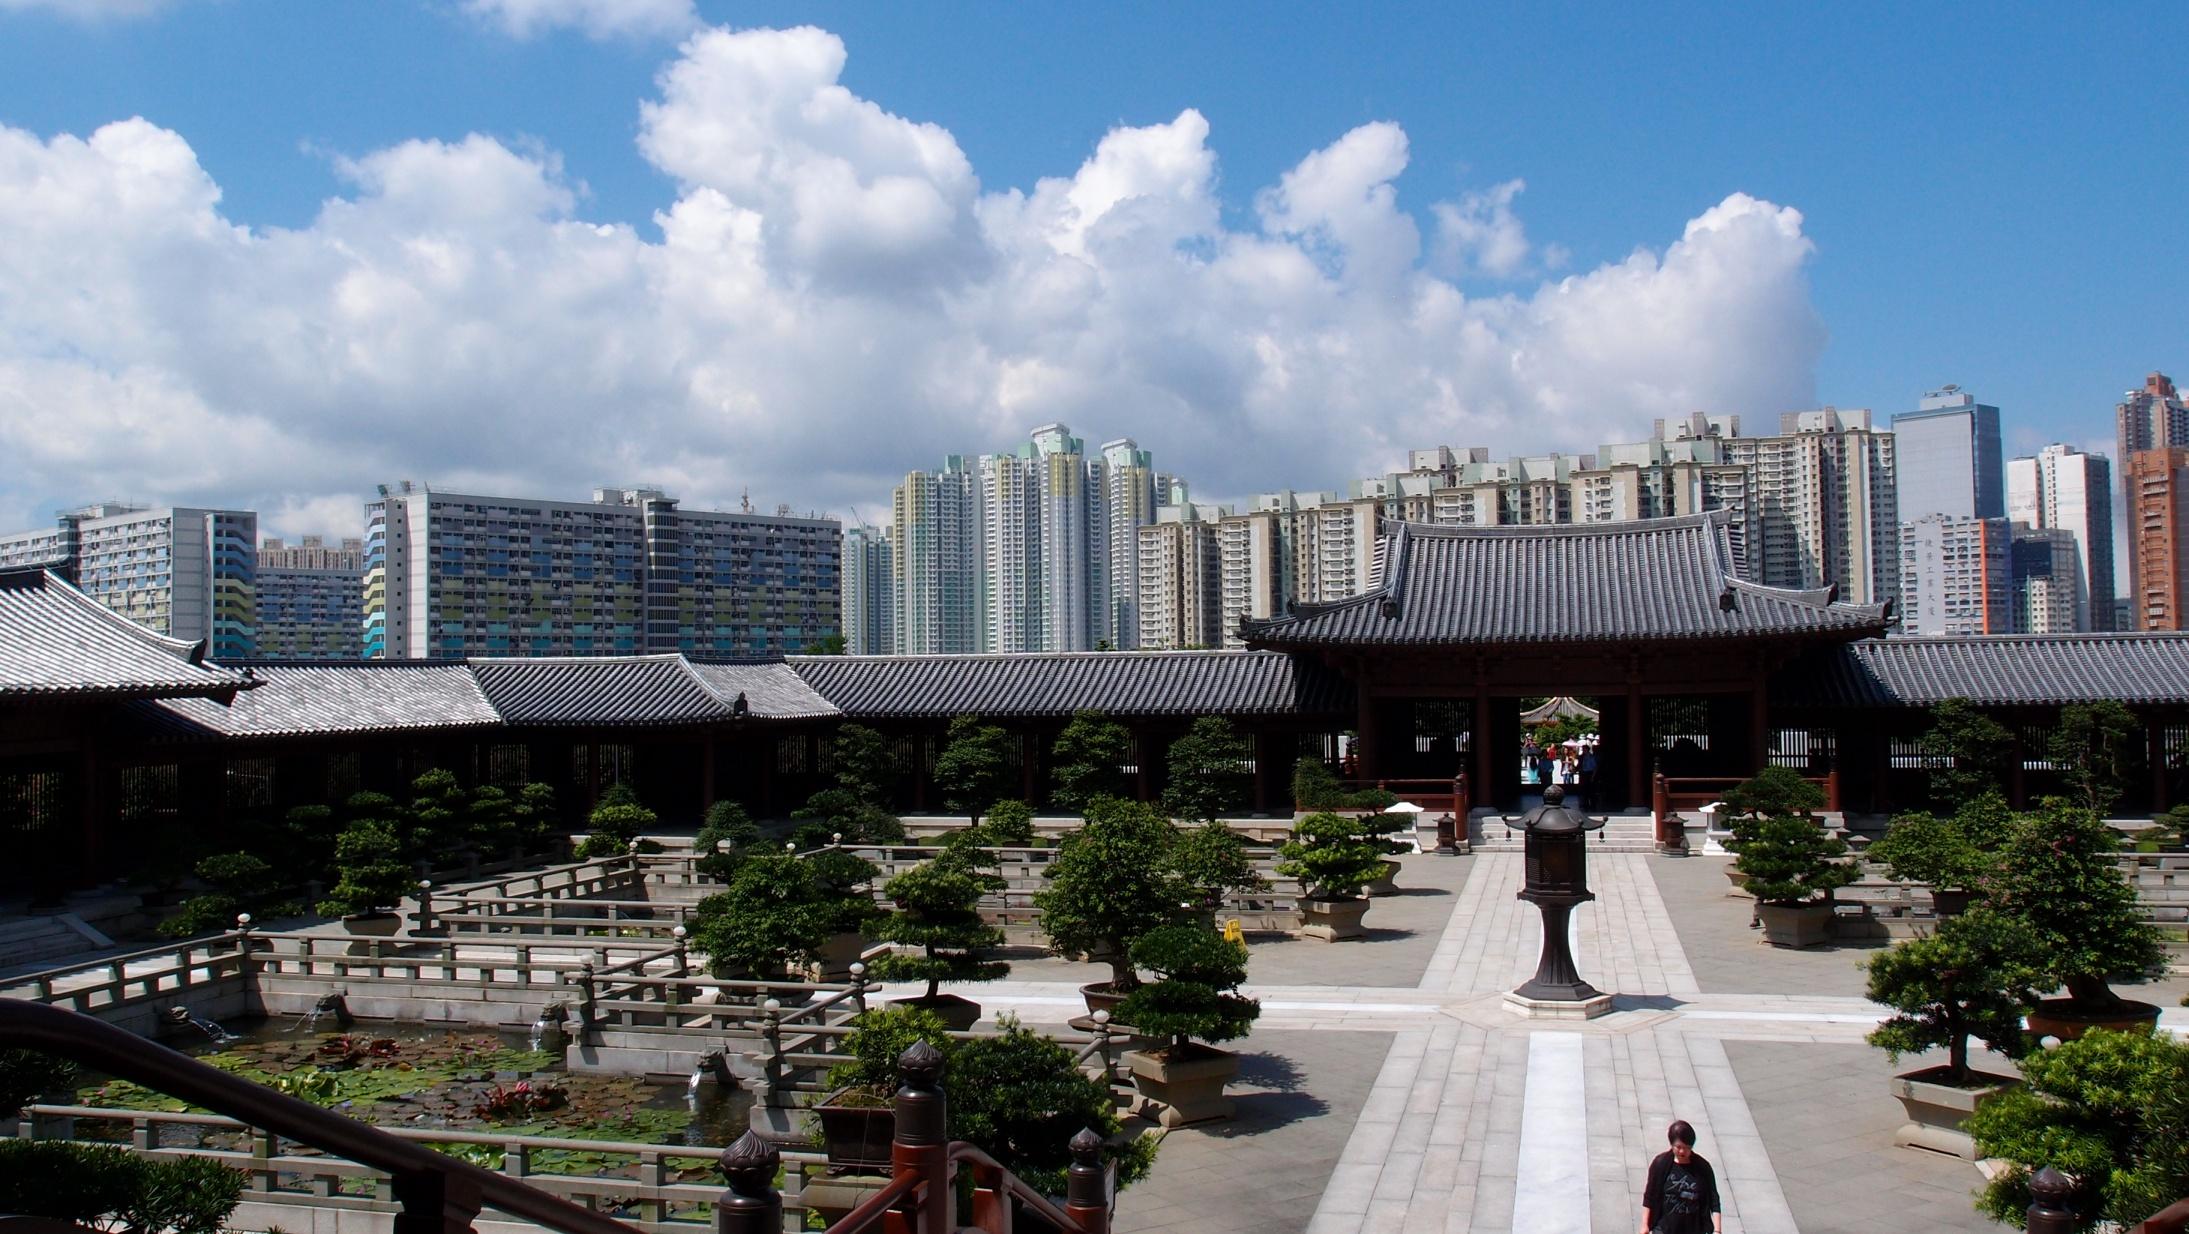 The Chi Lin Nunnery